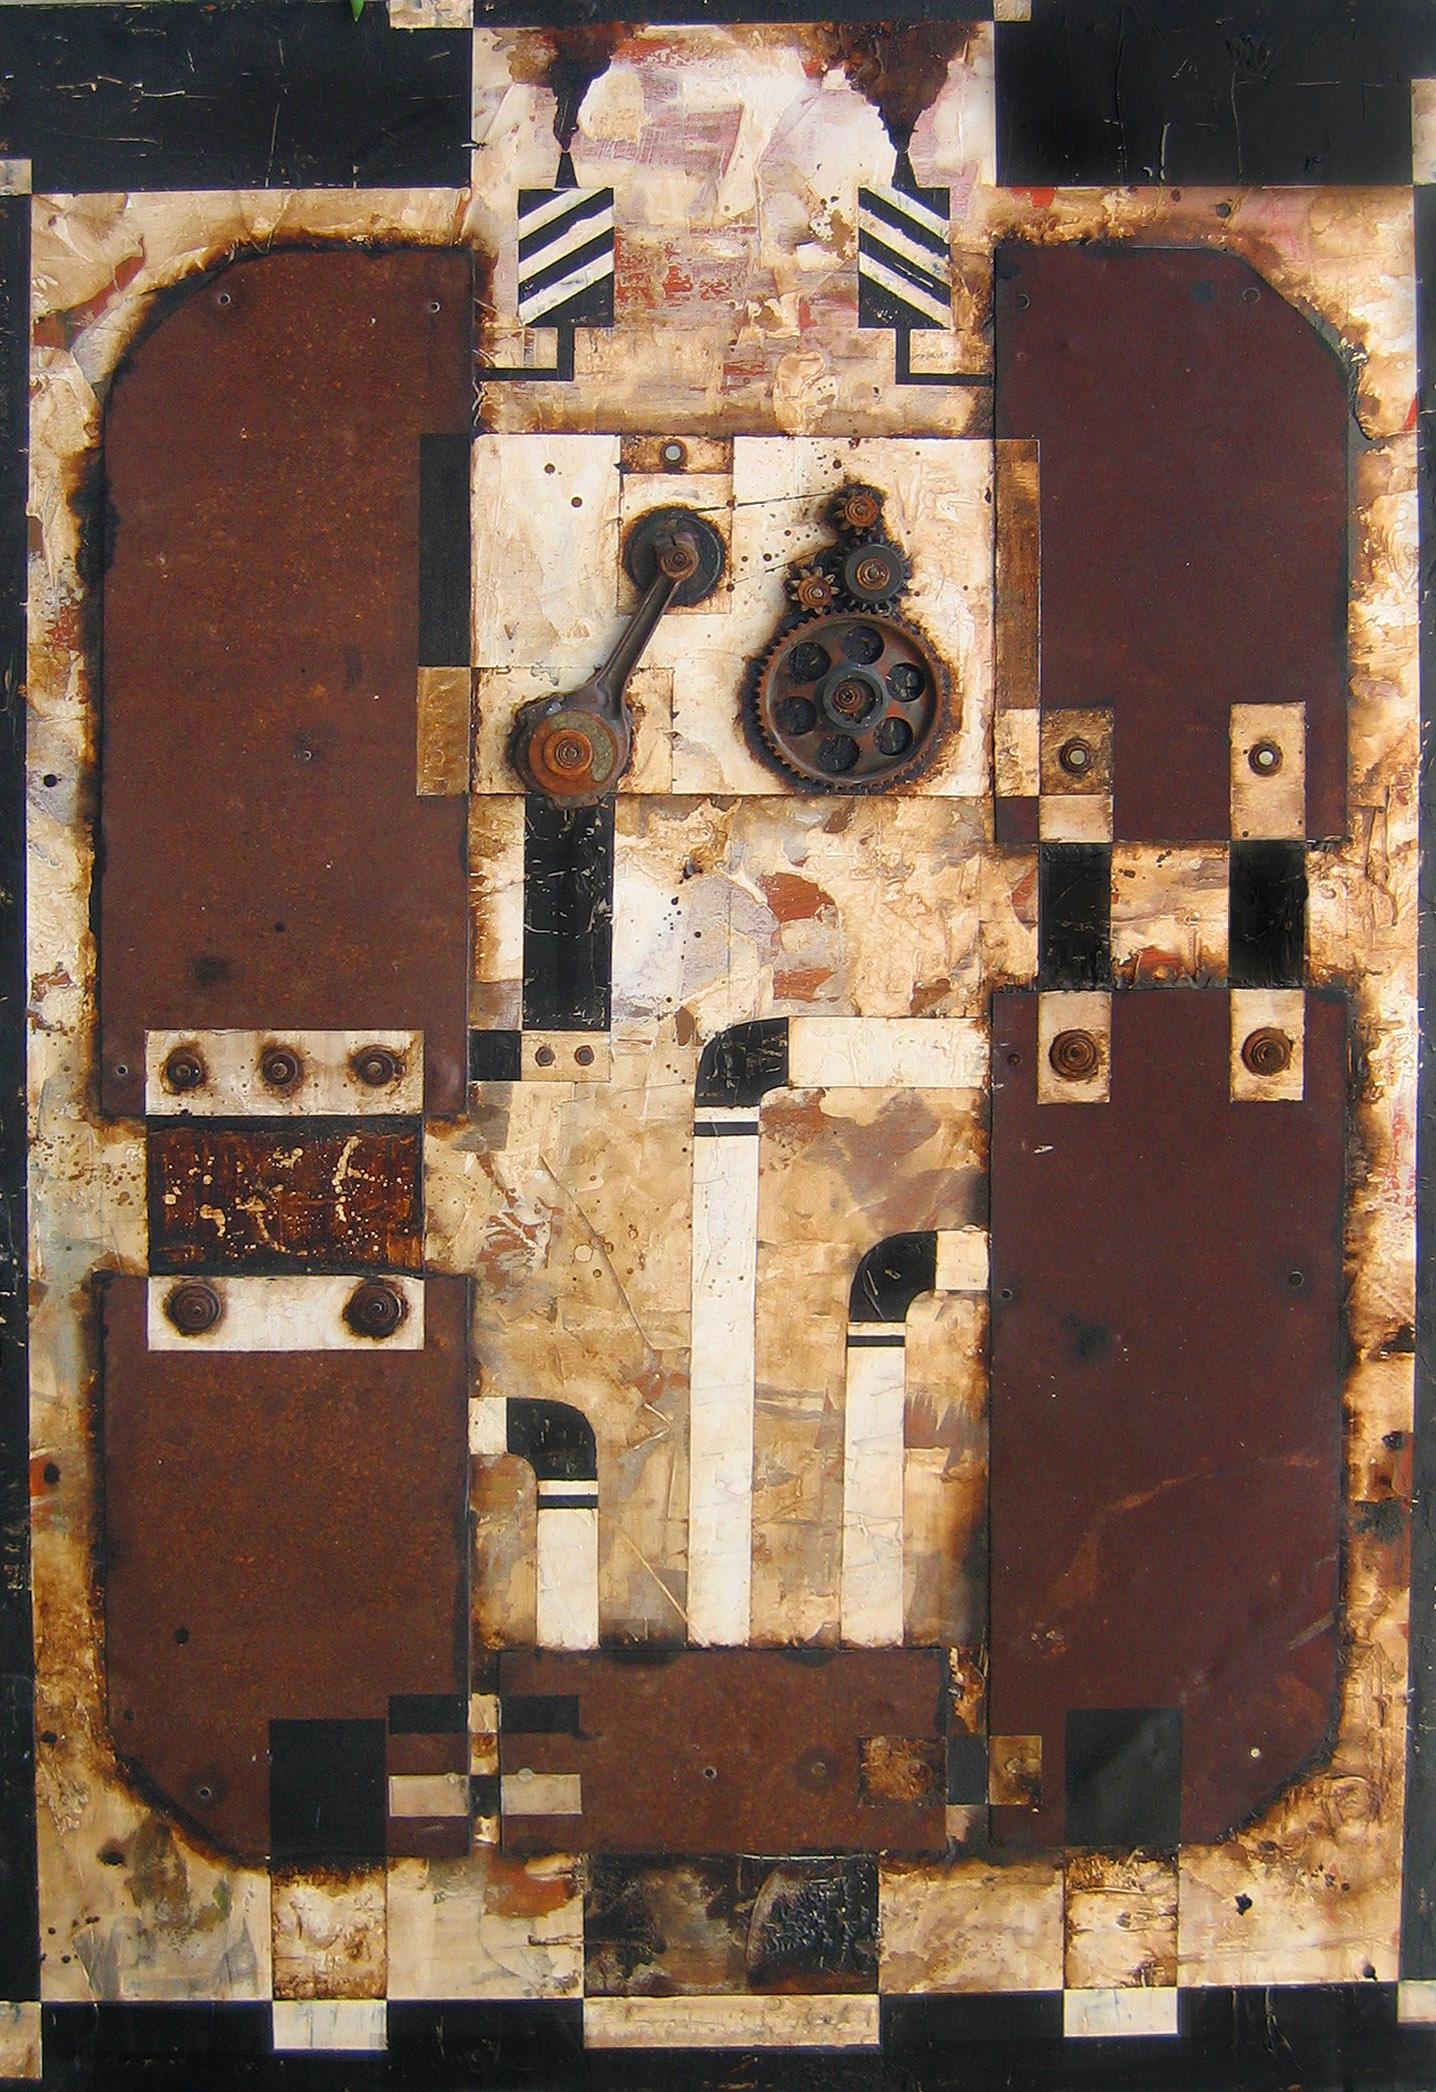 Mecano, 2006